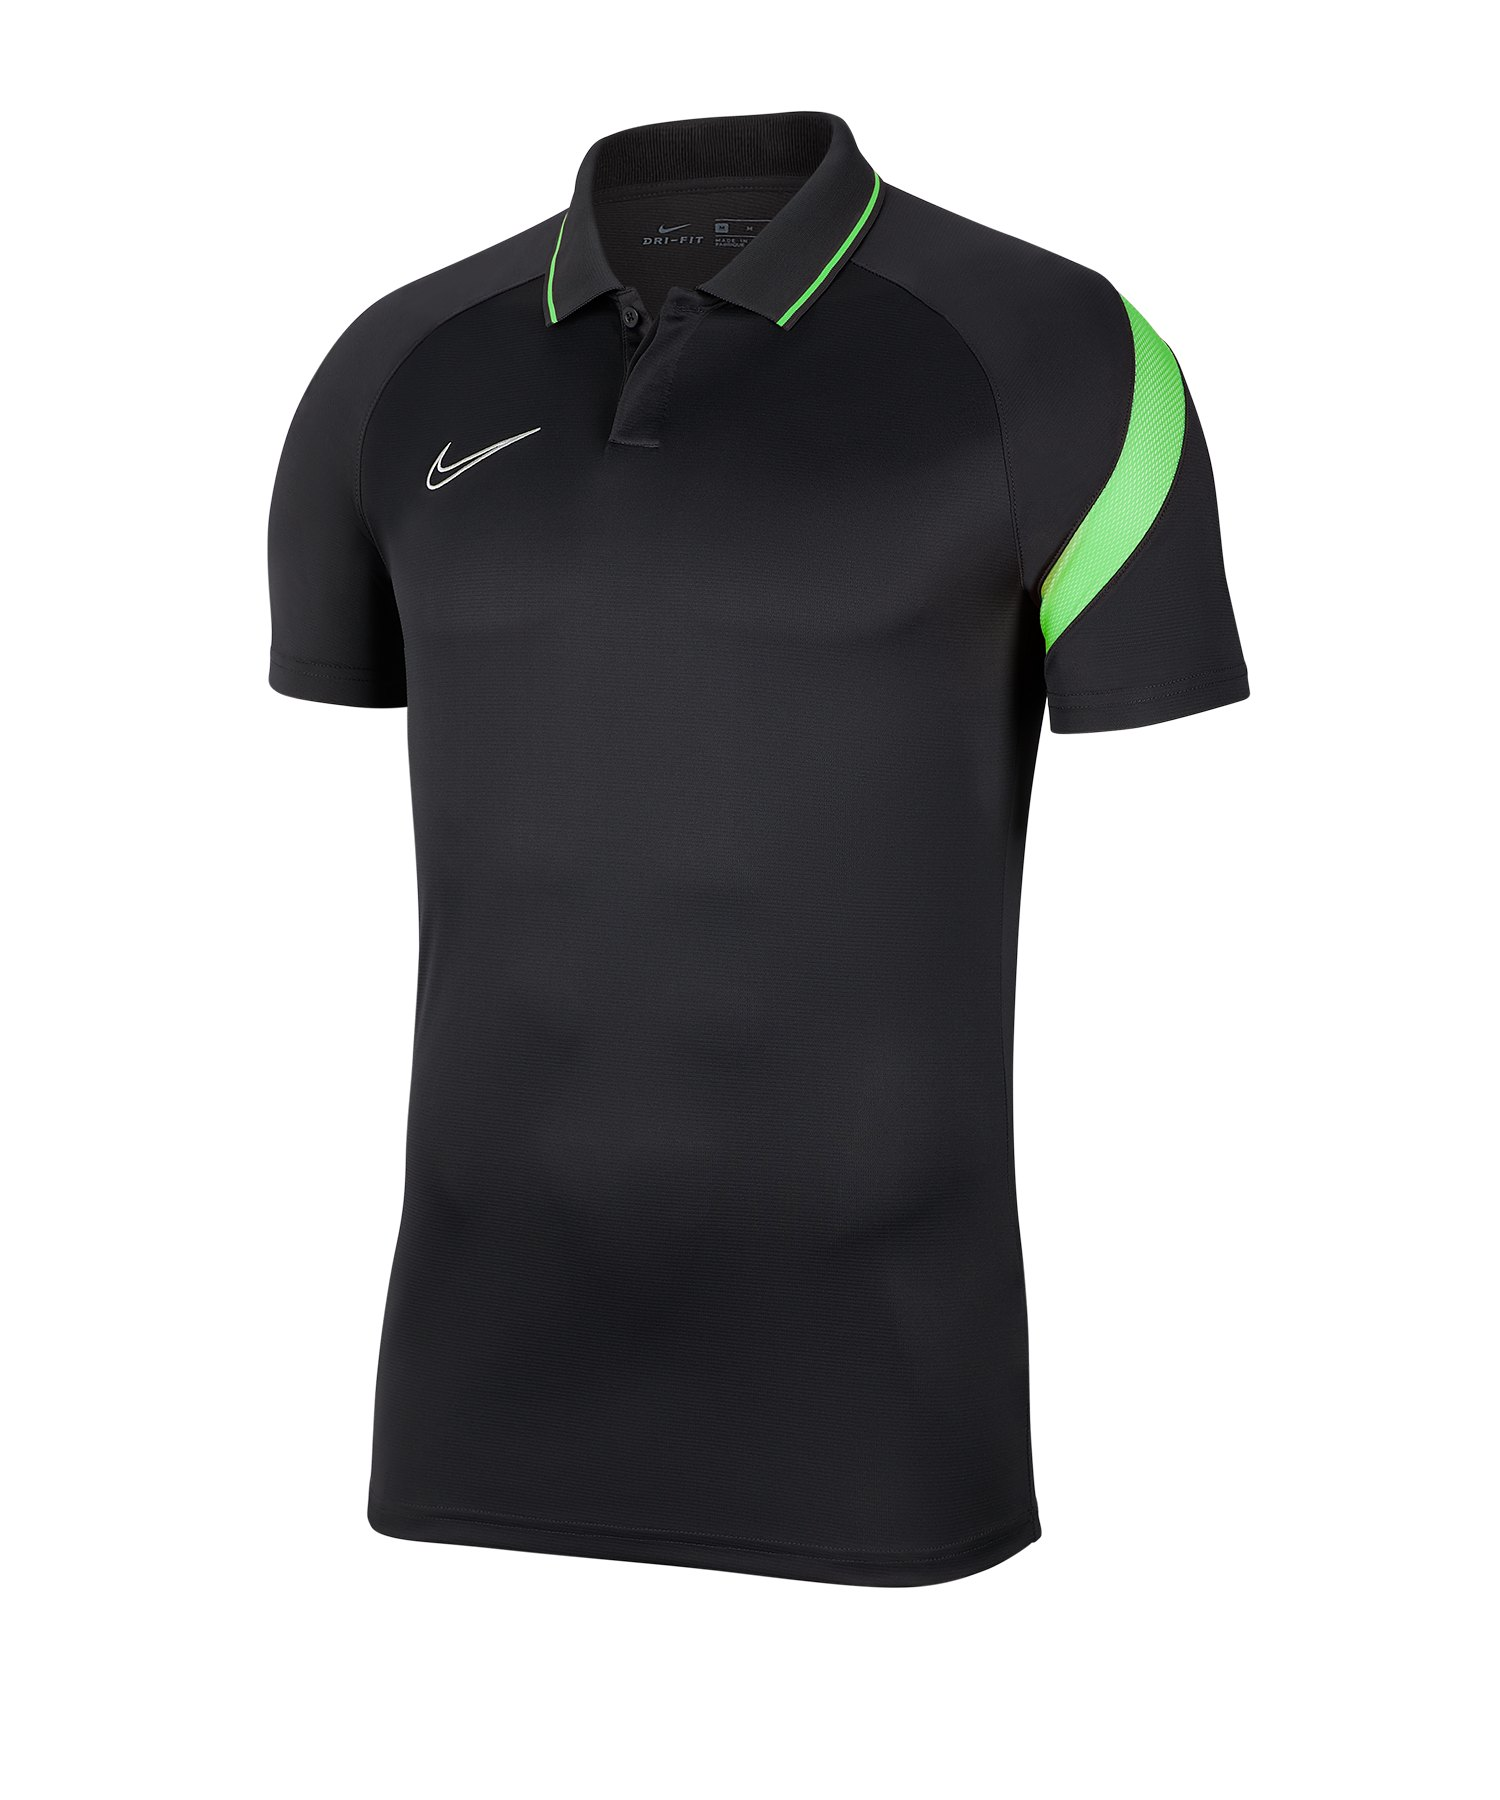 Nike Academy Pro Poloshirt Kids Grau Grün F060 - grau